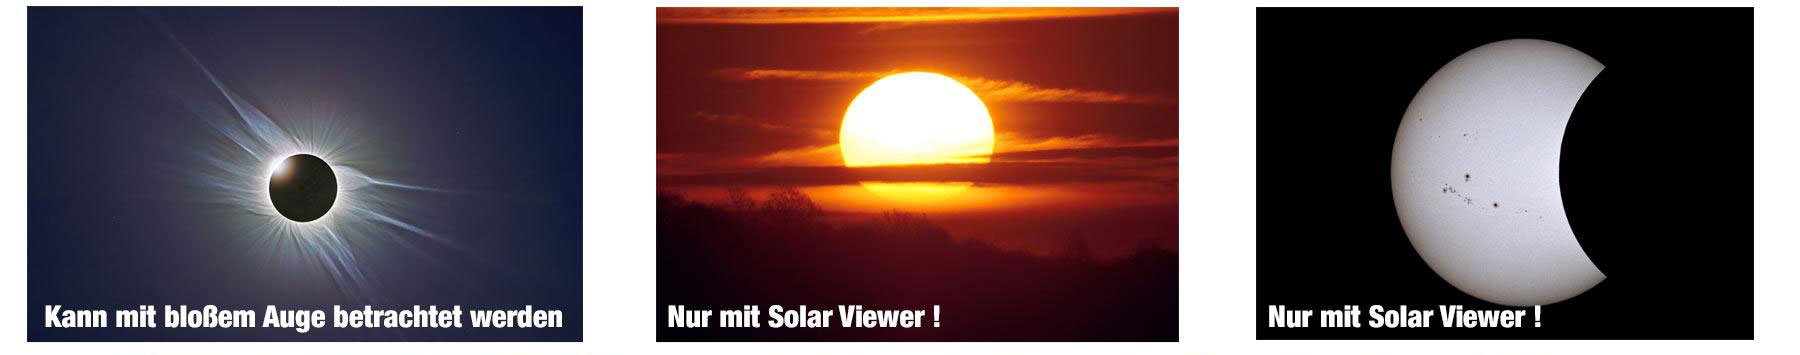 AstroSolar Silver Solar Viewer Anwendungsbeispiele